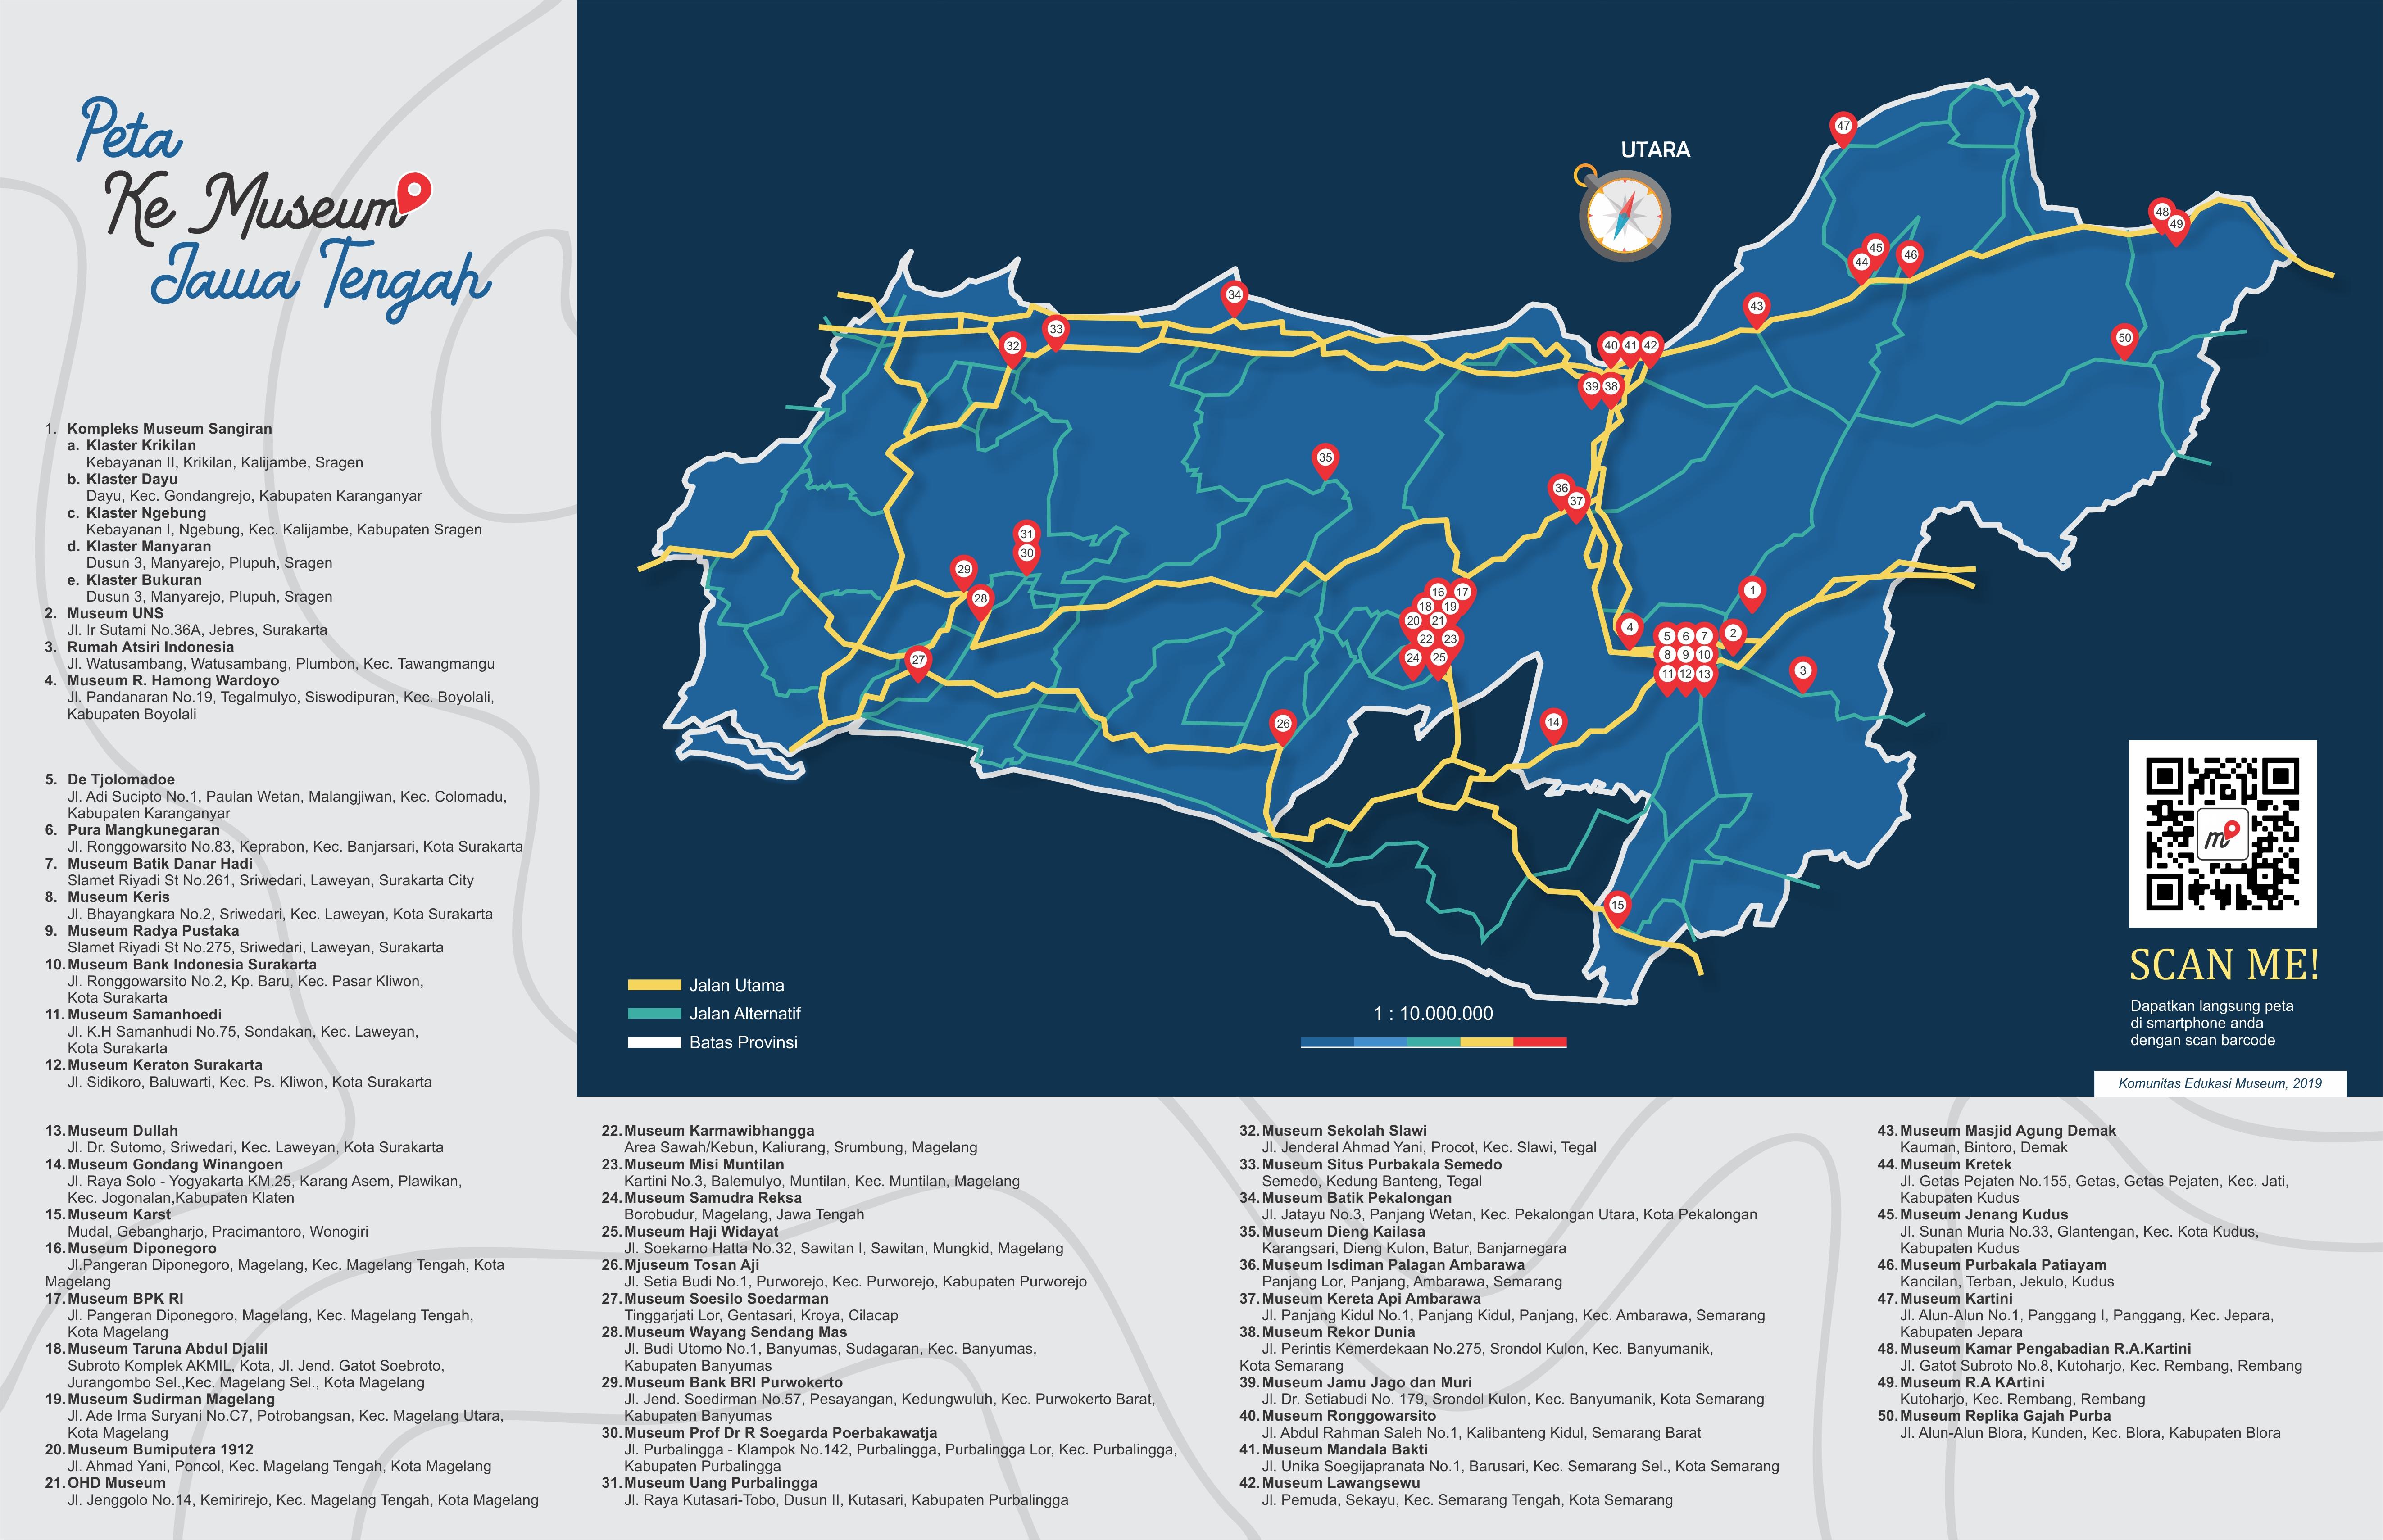 Peta Museum Jawa Tengah